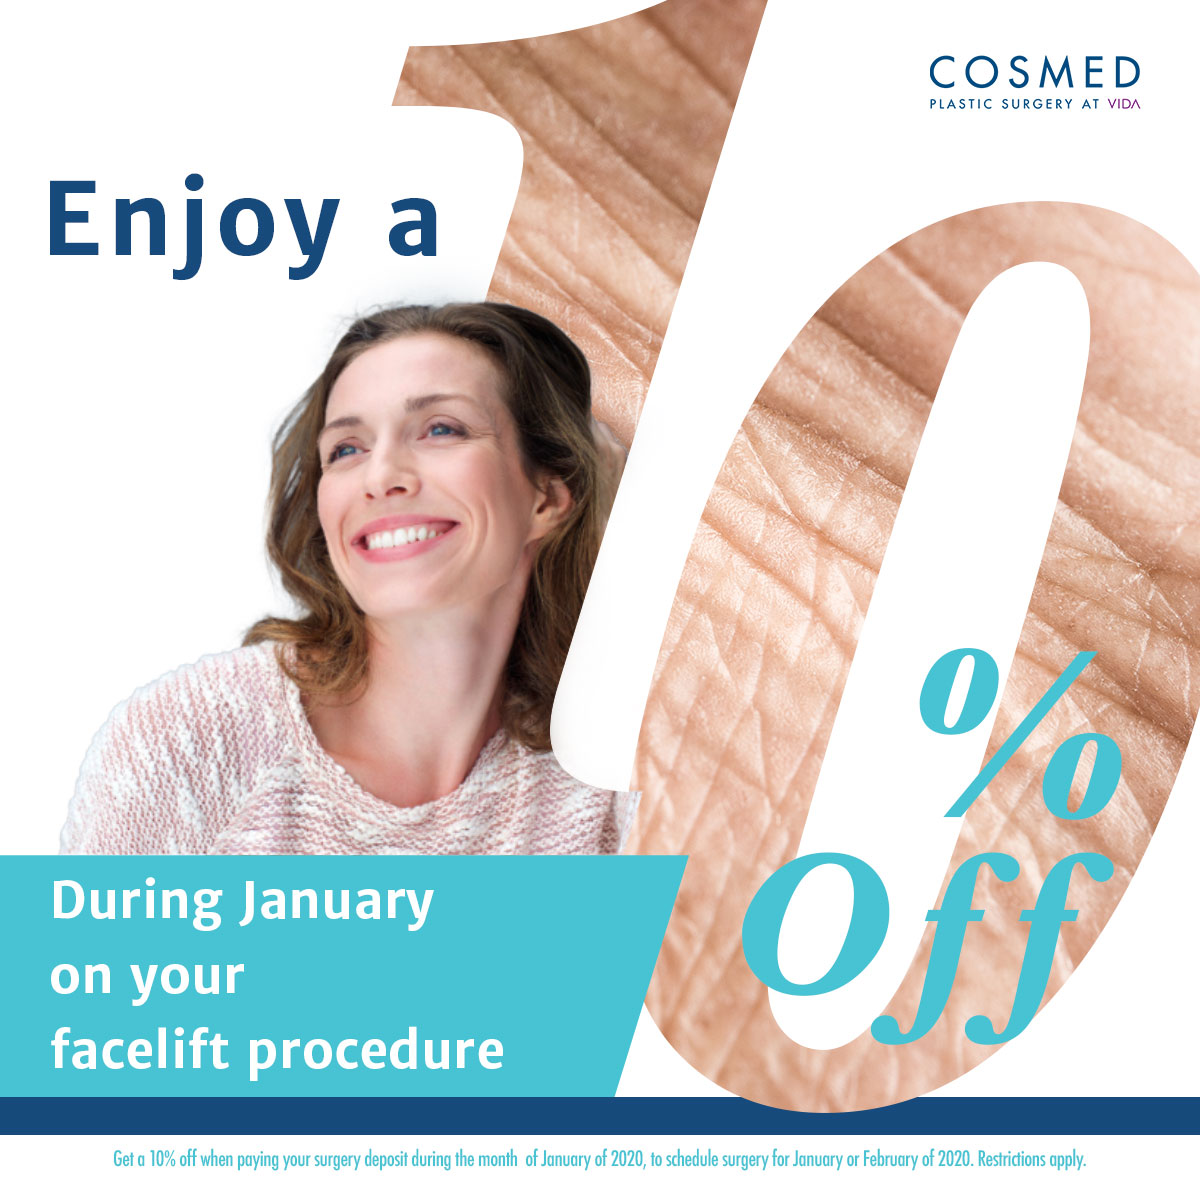 Facelift Procedure Promotion Face Beauty Surgery VIDA COSMED